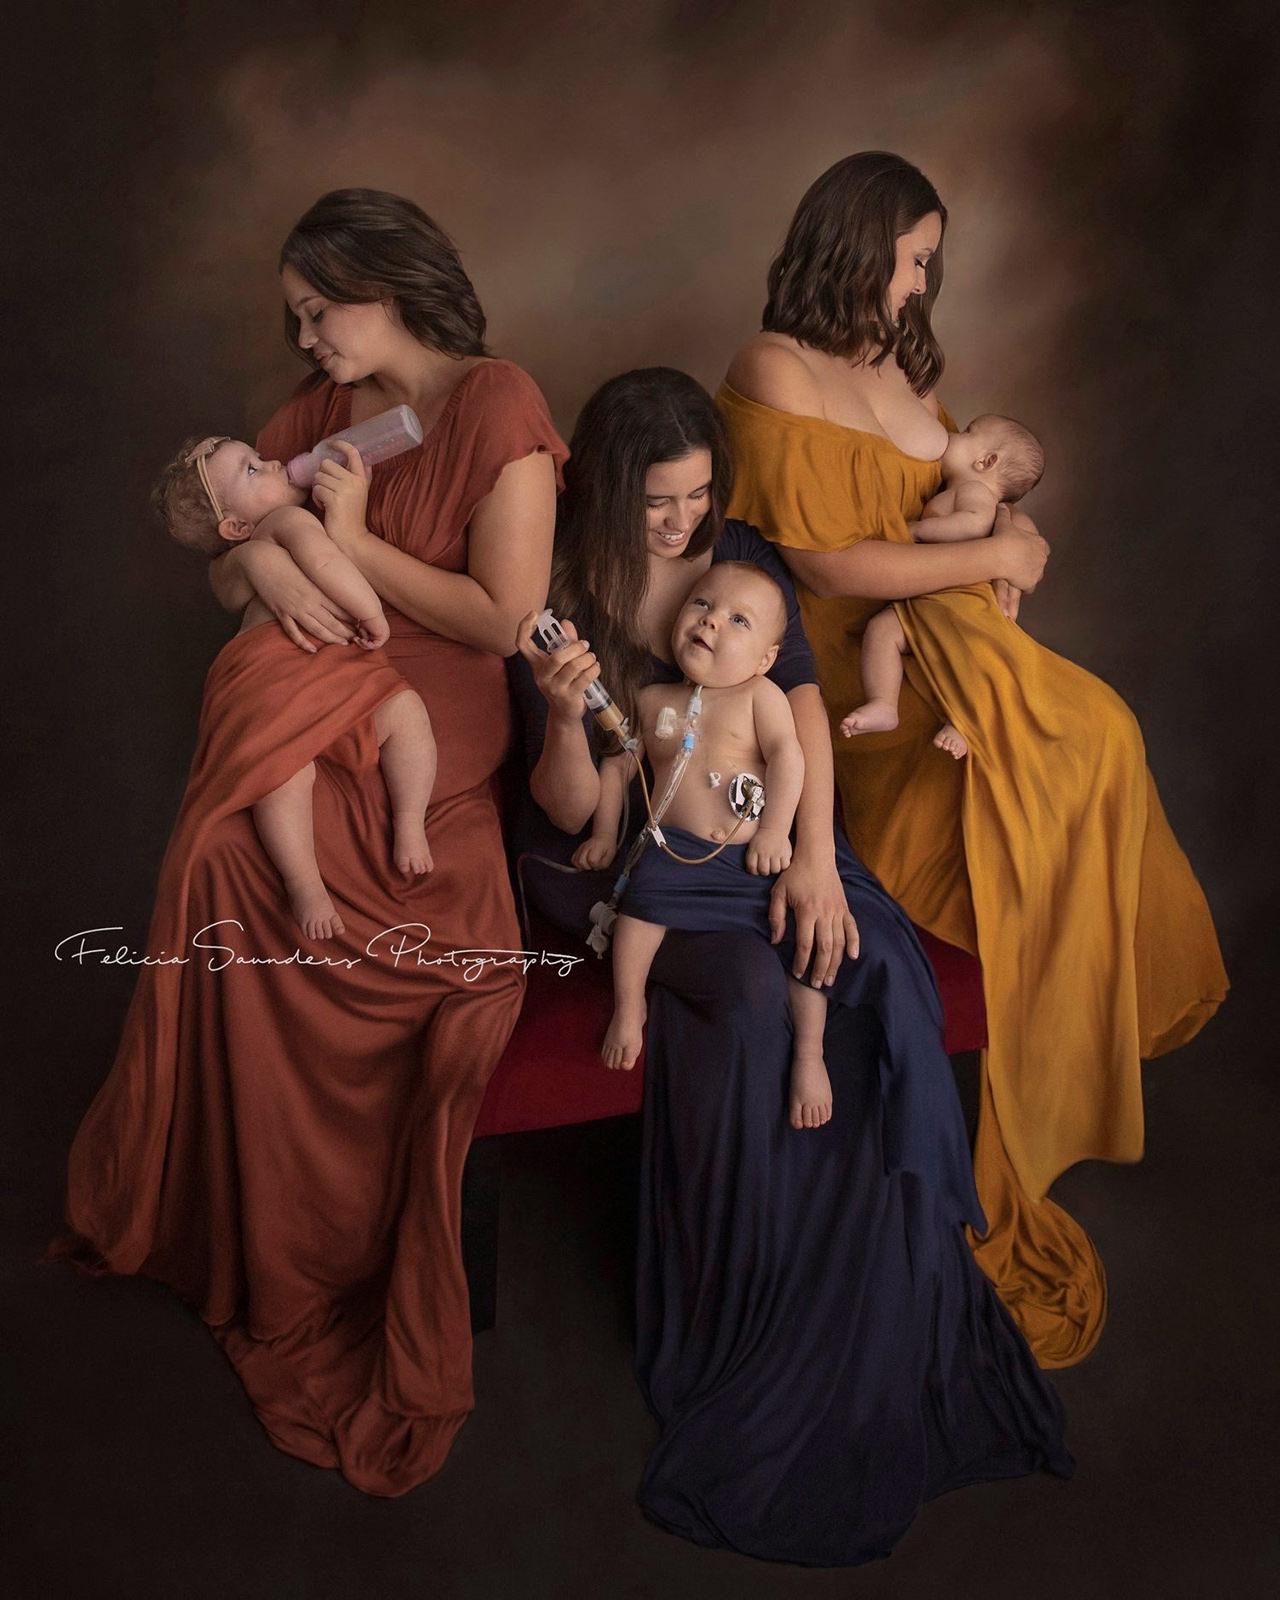 amma i alla former breast feeding göteborg amma